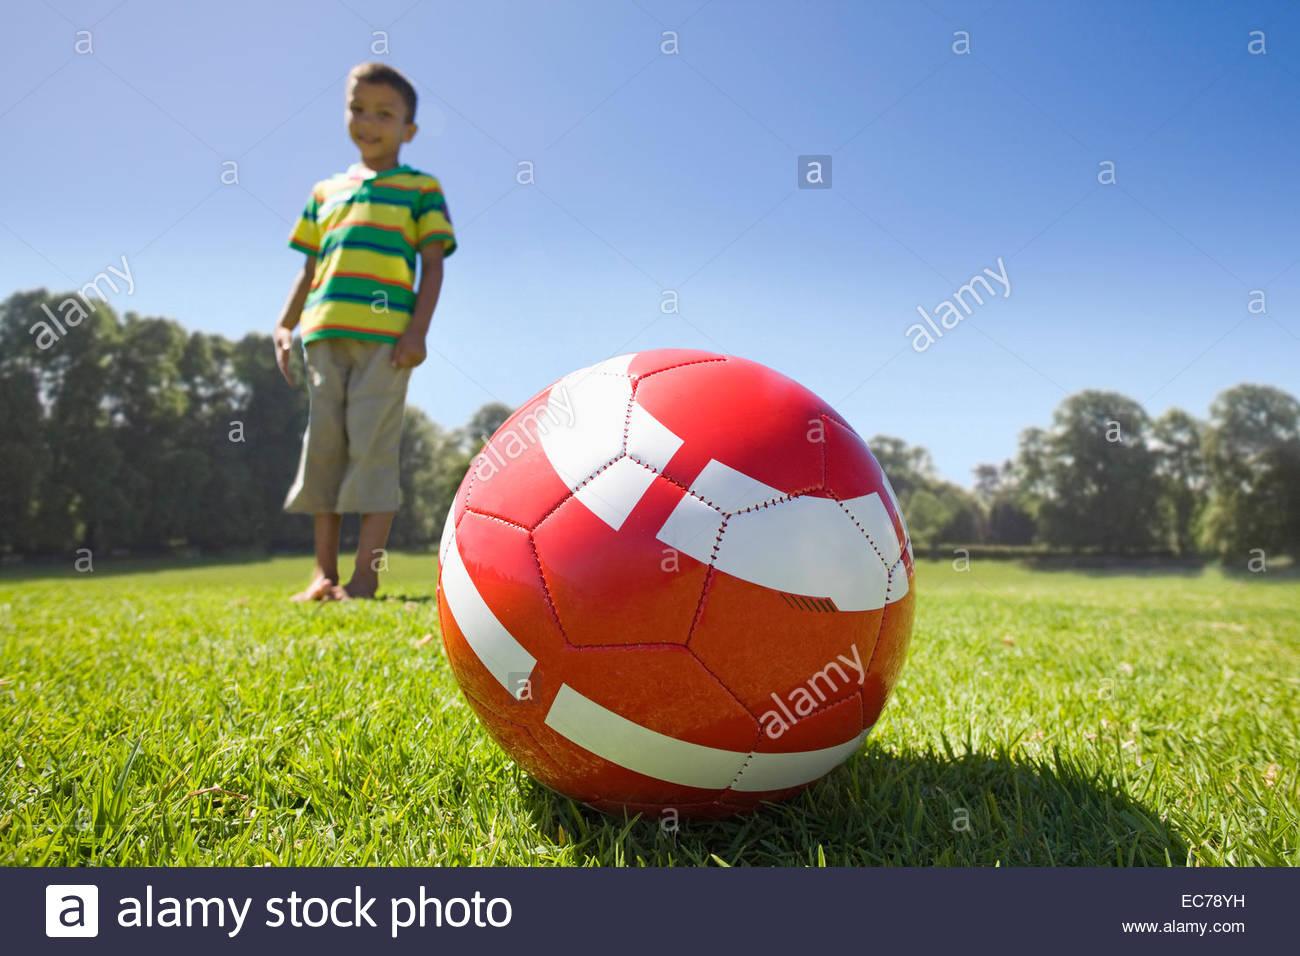 Junge im Park mit dem Fußball Stockbild